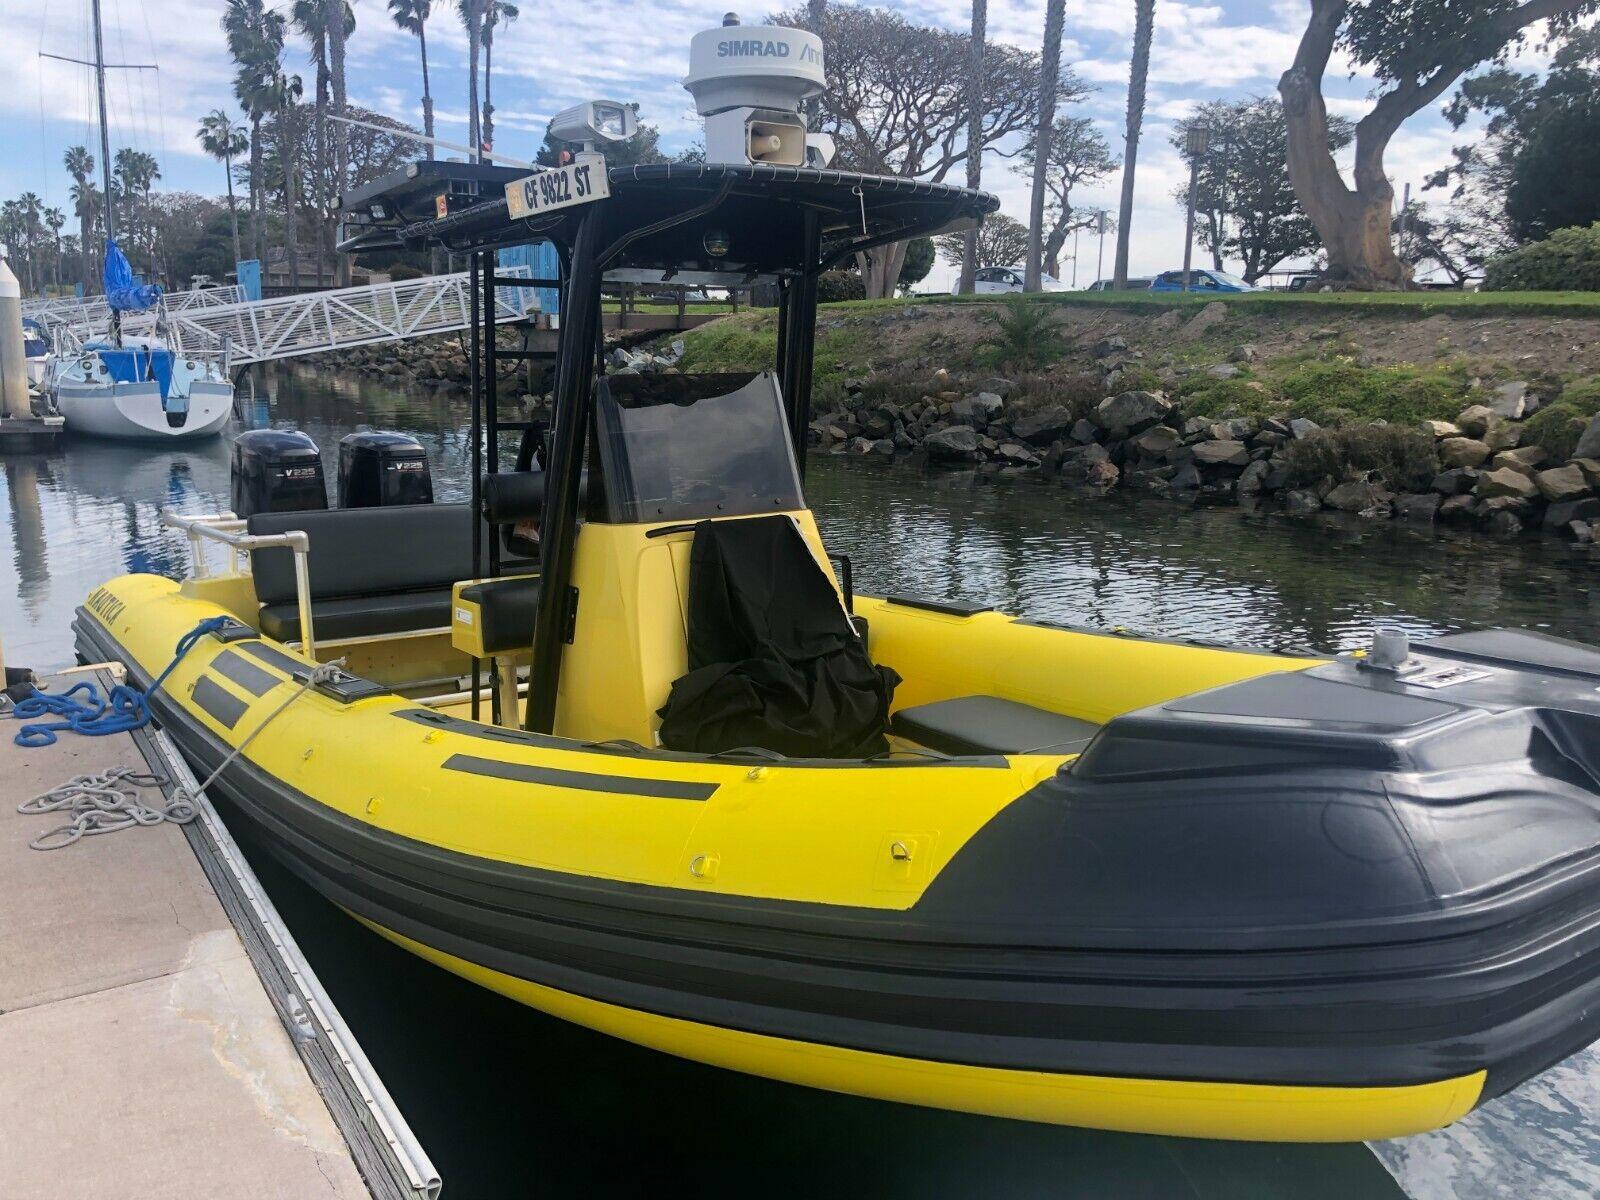 2002 Nautica 25' RIB Inflatable Boat project parts Twin Yamaha 225 NO RESERVE!!!